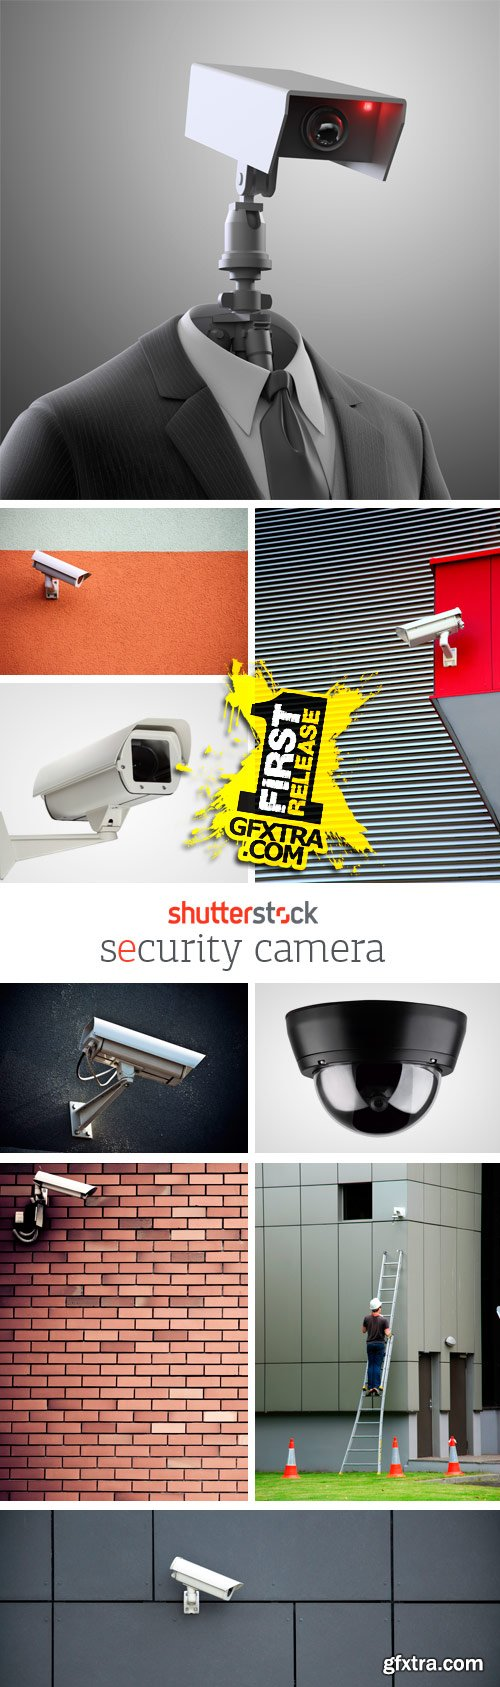 Amazing SS - Security Camera, 25xJPGs